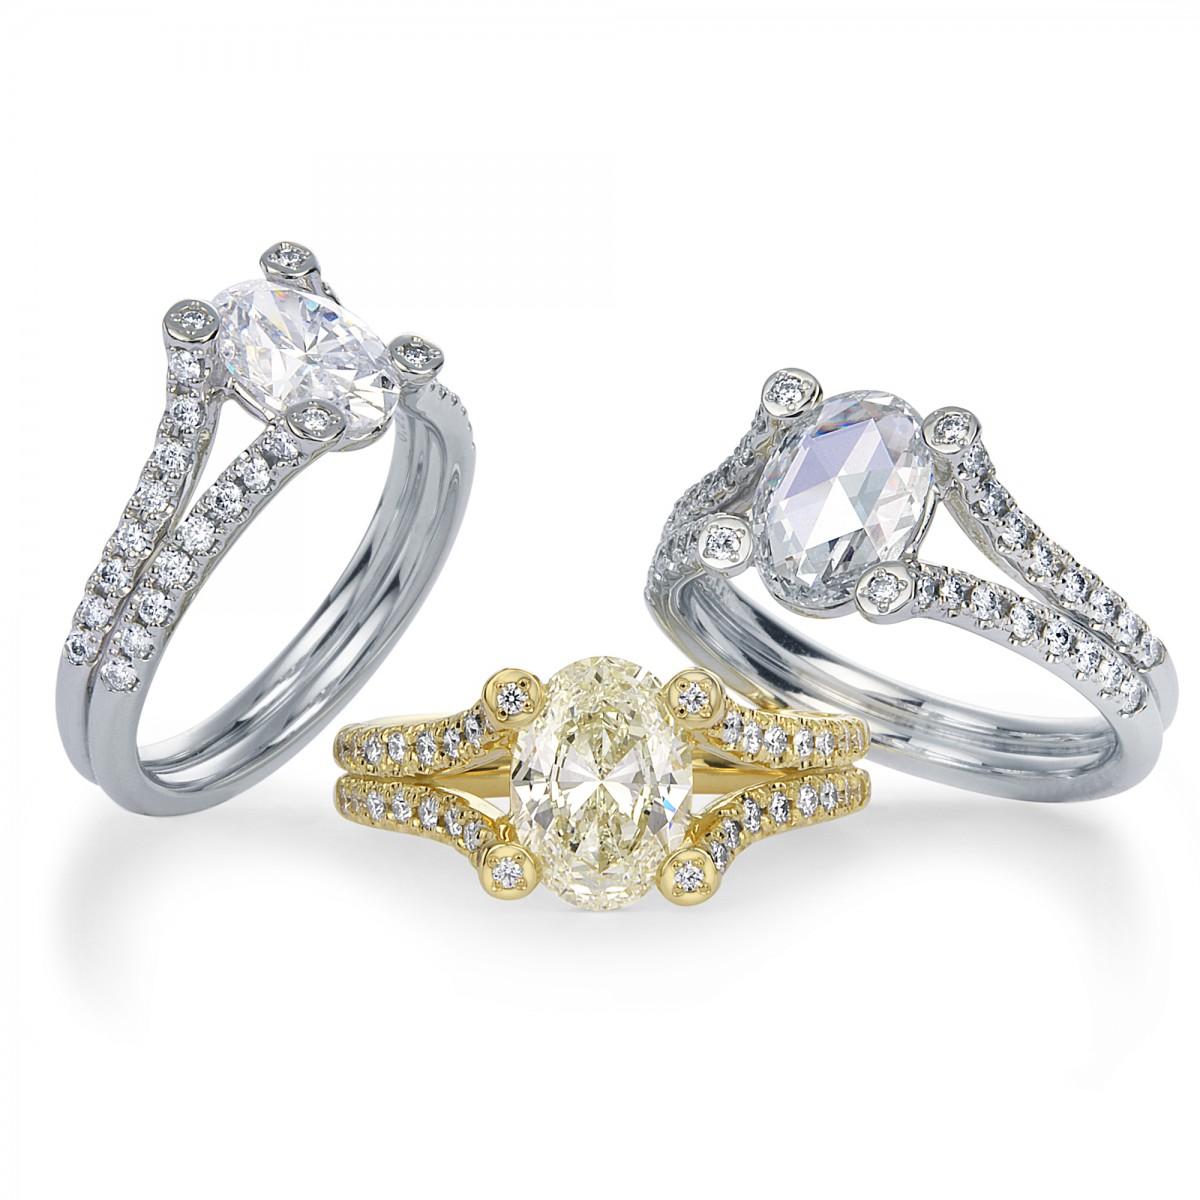 Oval Cut Diamond Rings By Mark Hiroshi Willis